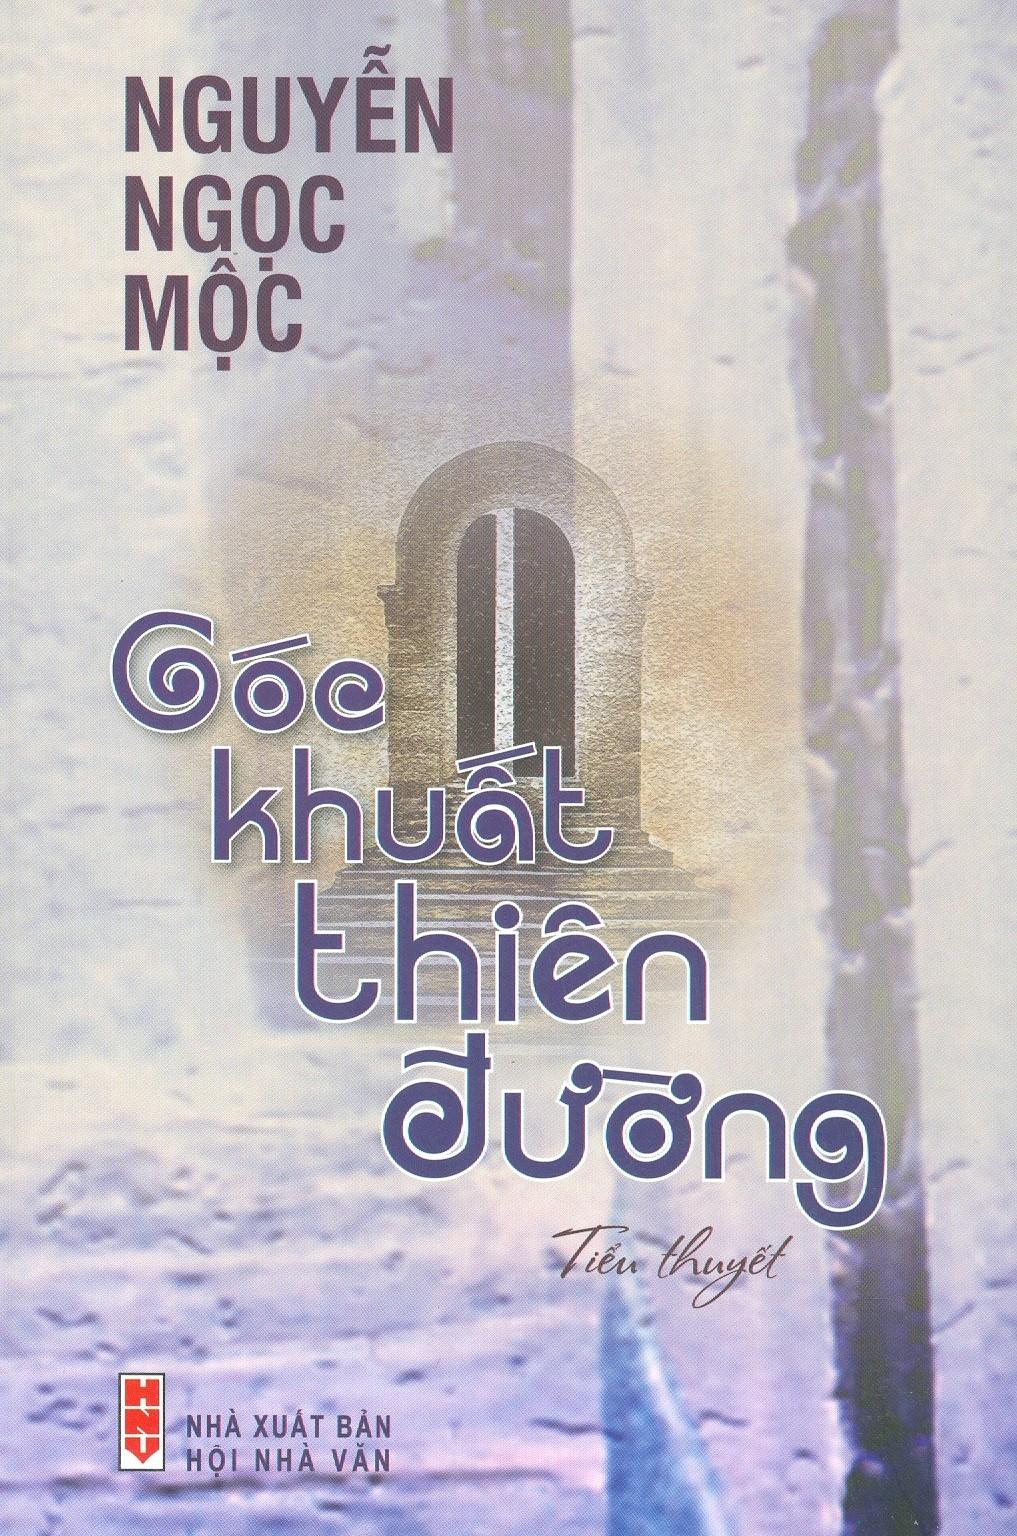 goc-khuat-thien-duong.u547.d20161111.t112558.888096.jpg